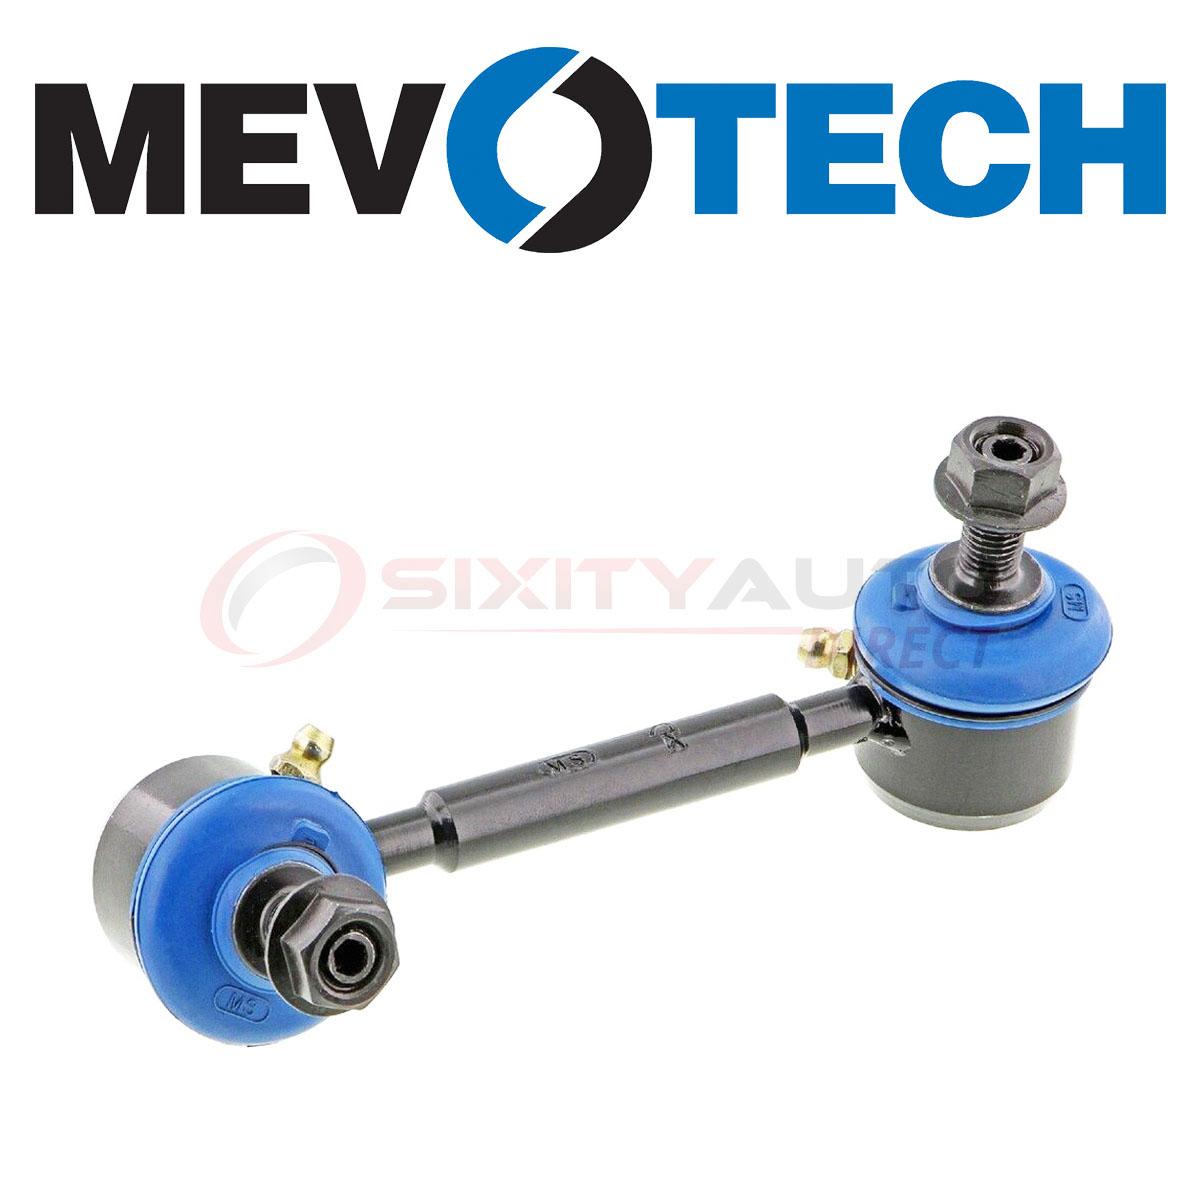 Mevotech Suspension Stabilizer Bar Link Kit For 2014-2016